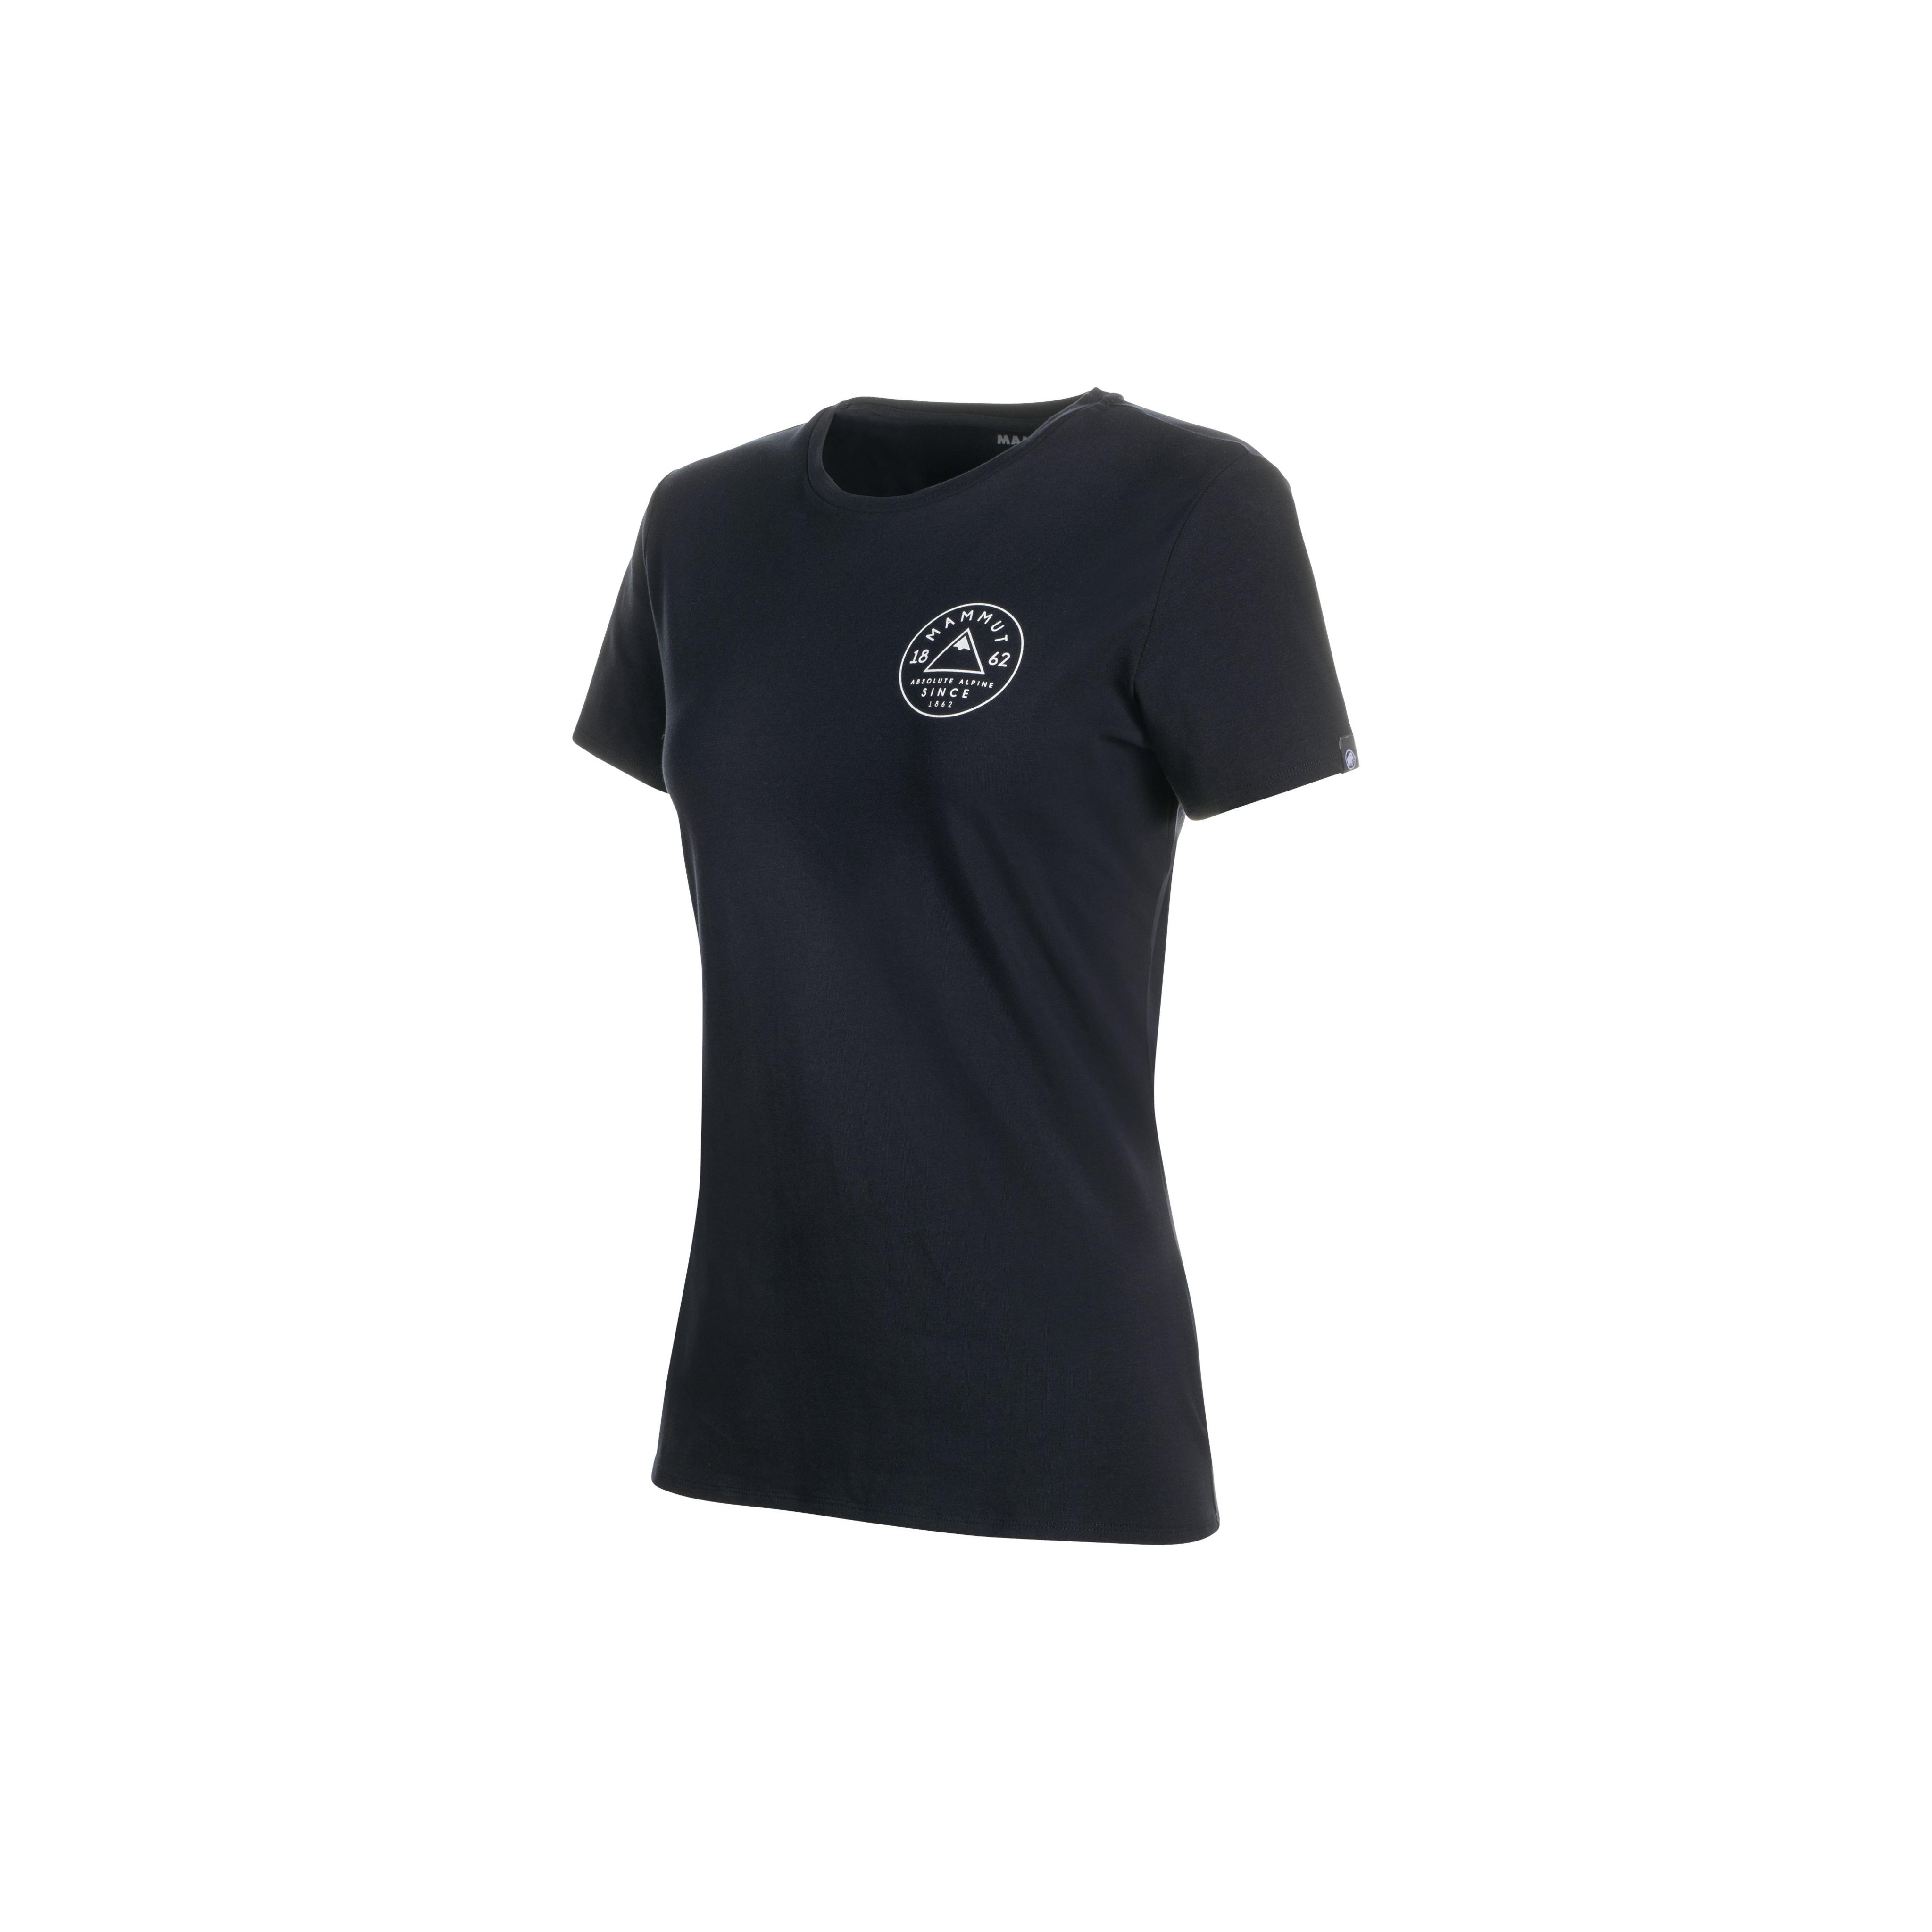 Absolute Alpine T-Shirt Women - black, XXS thumbnail